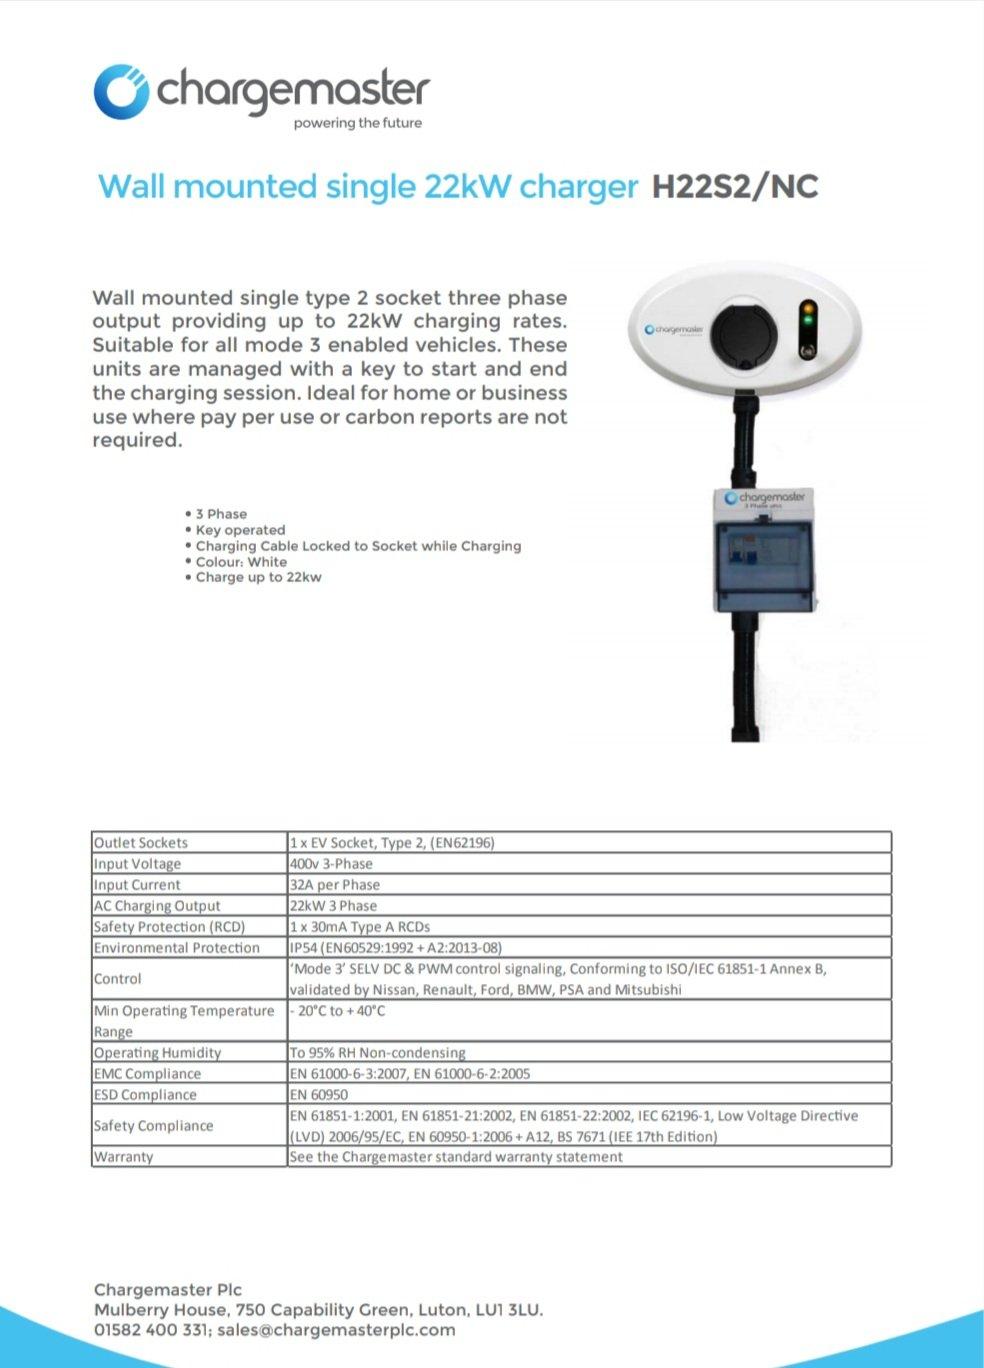 Chargemaster H22s2 22kw 3phase Wiring